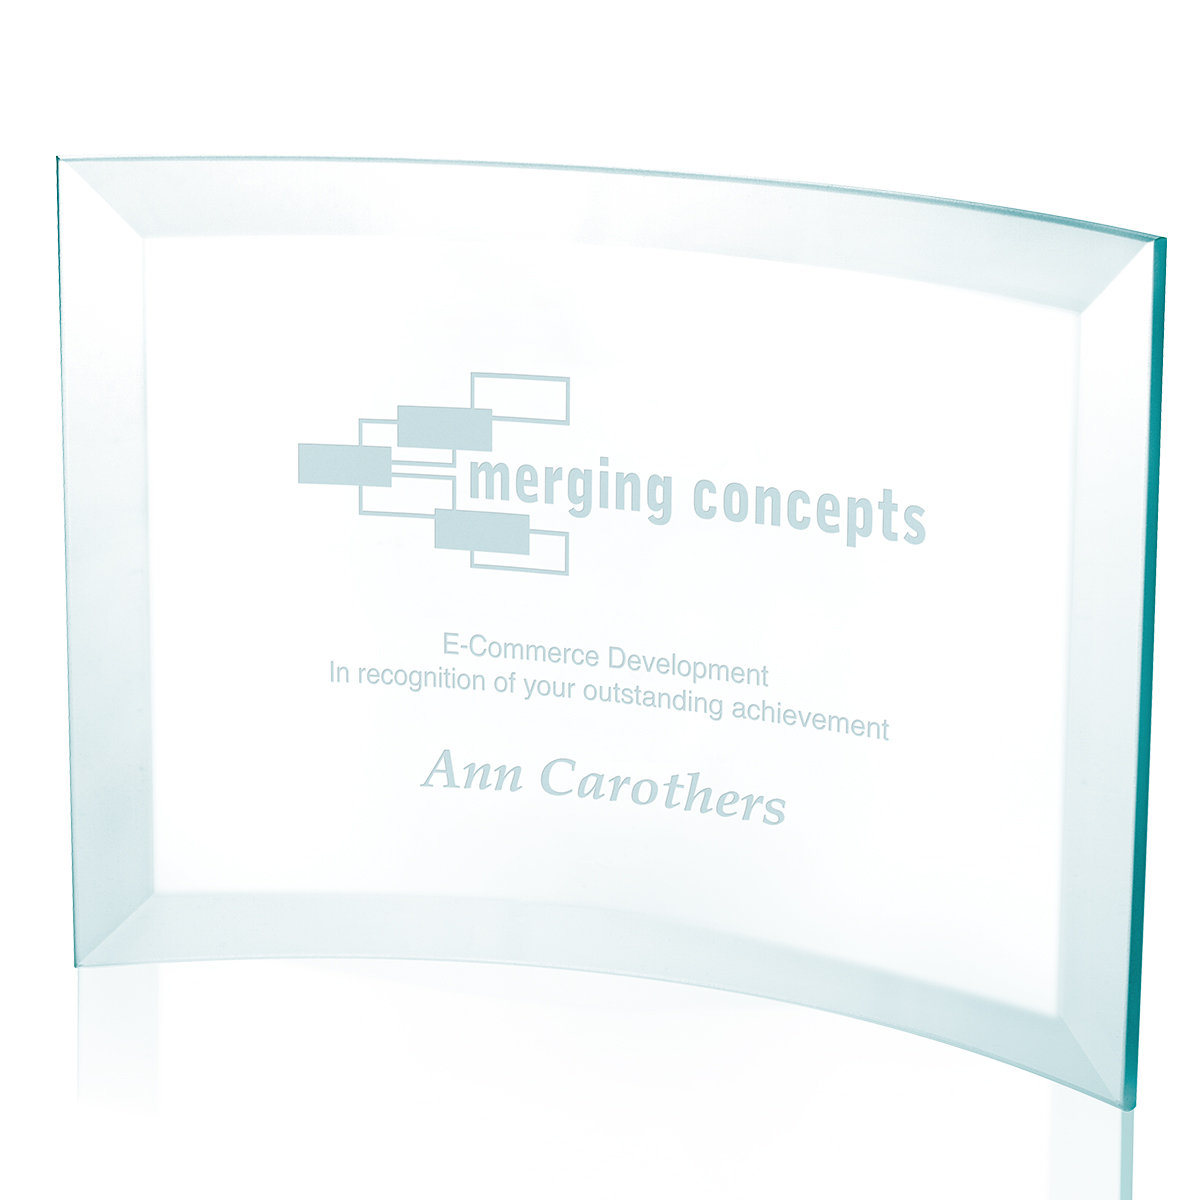 Jaffa Small Jade Crystal Scroll Award - Deep Etch Imprint